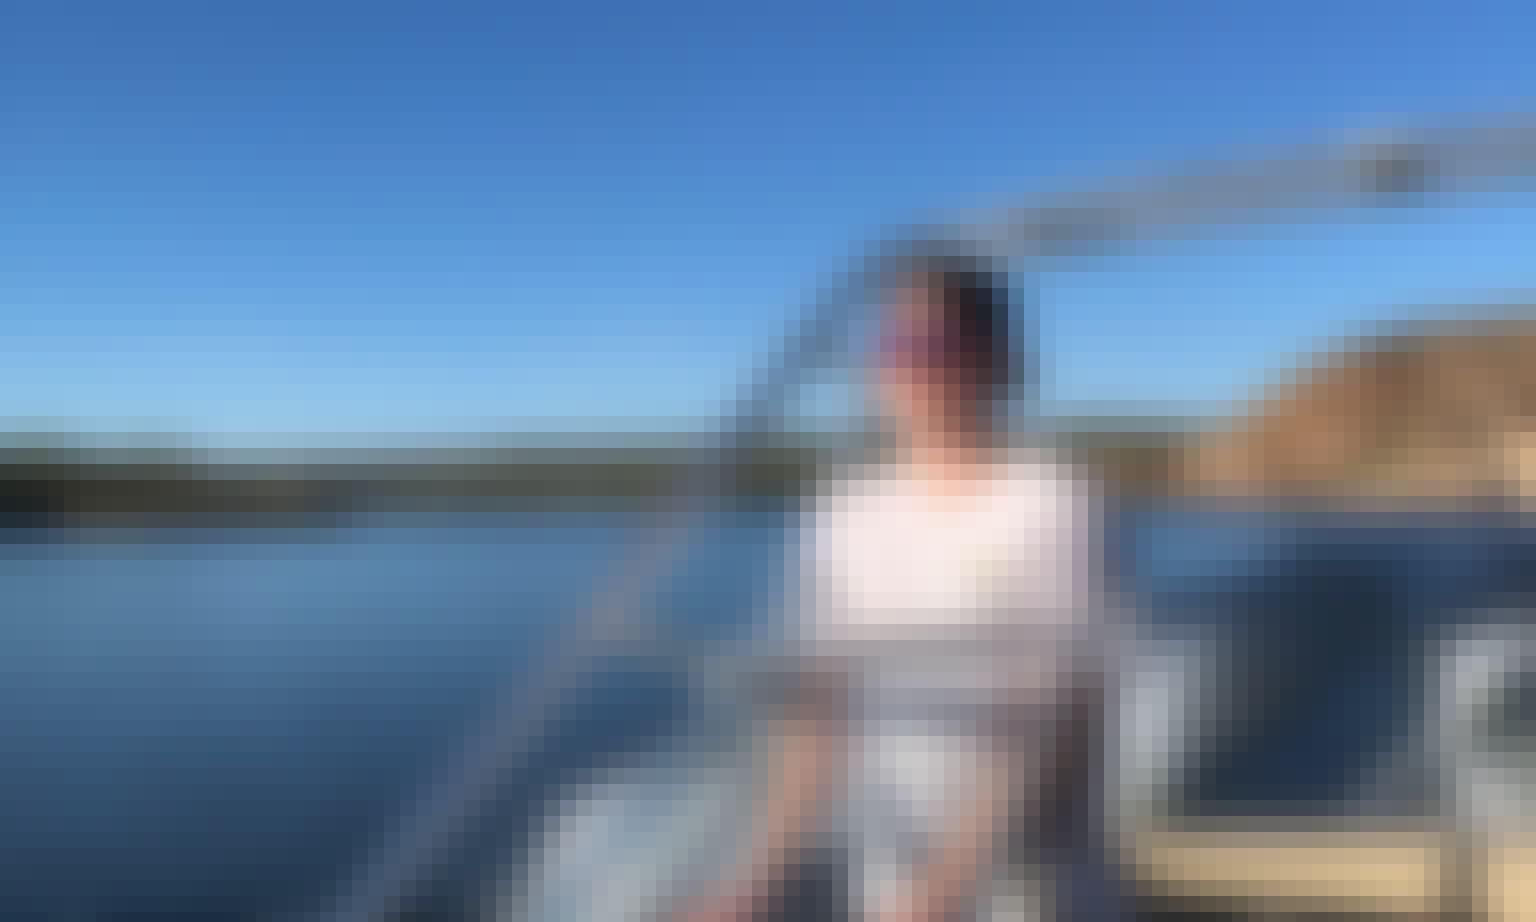 Waterski, Wakeboard, Wakesurfing, on Suargo Lake w Captain & Instruction - Only 45 Min From Phoenix